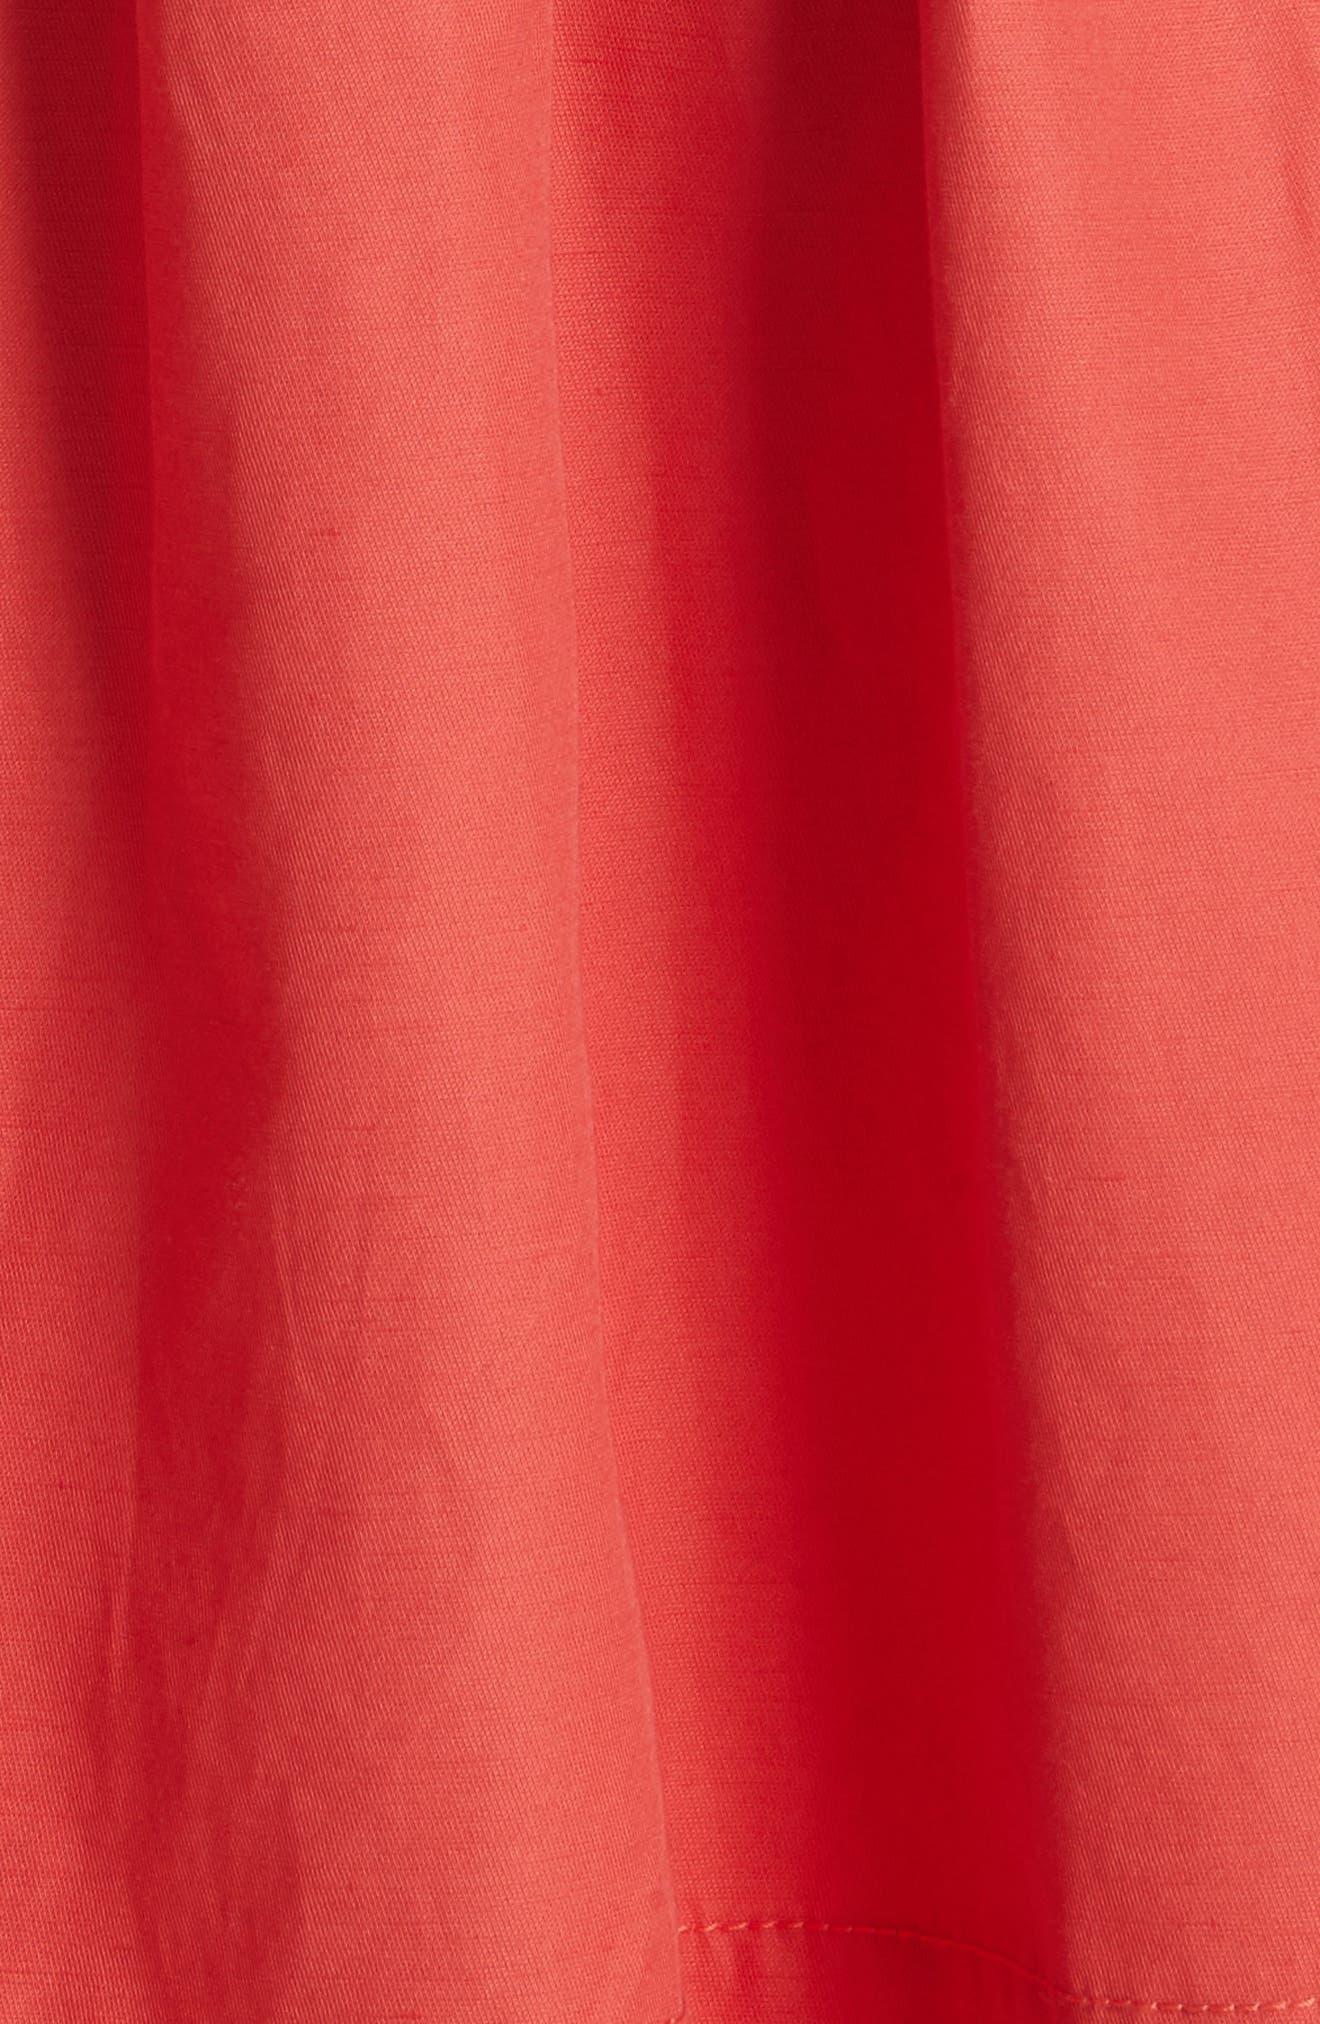 Sleeveless Ruffle Hem Dress,                             Alternate thumbnail 5, color,                             601